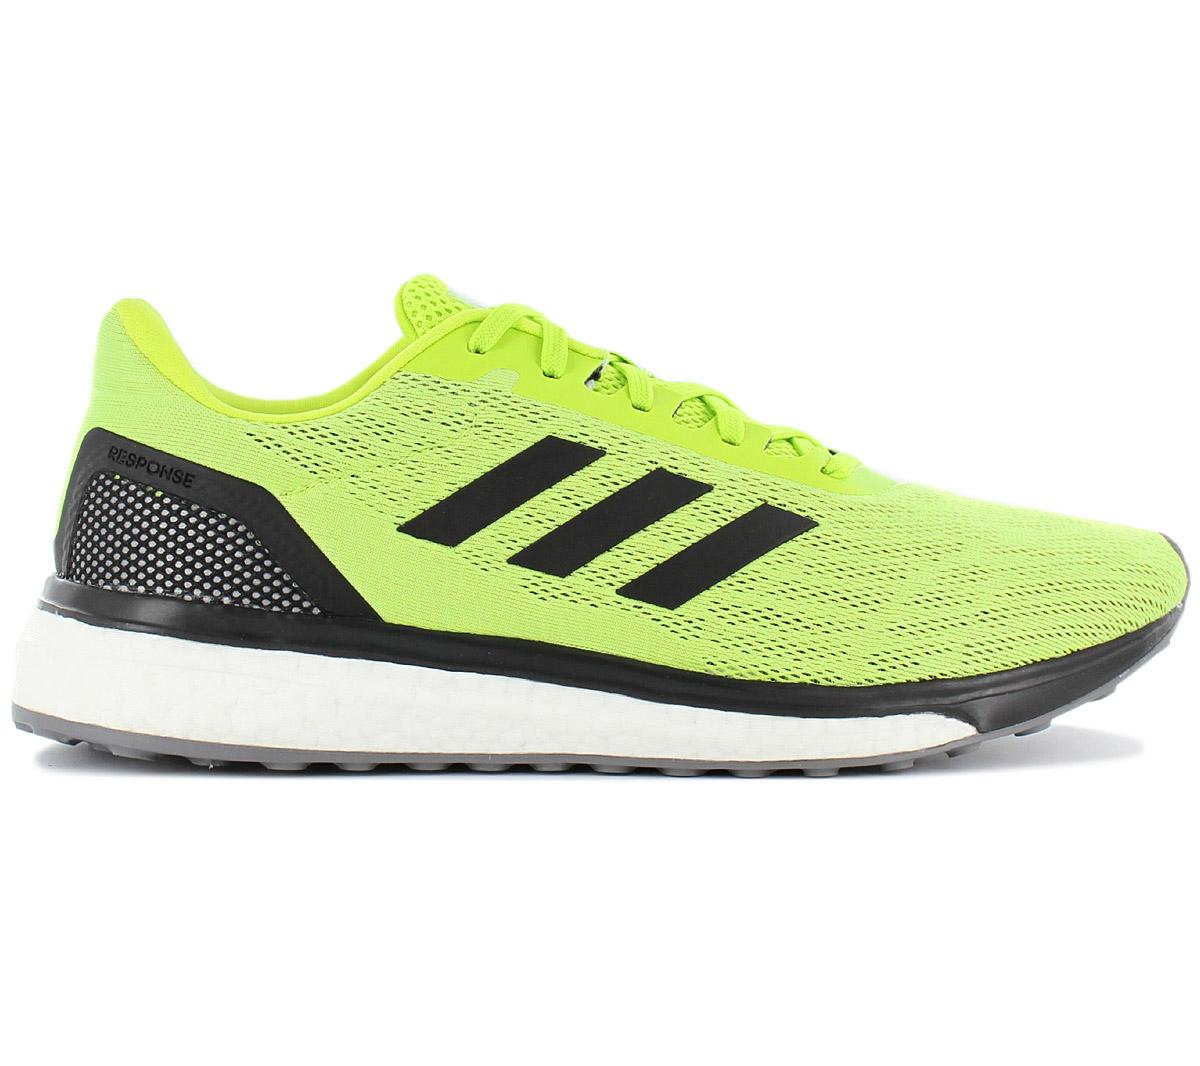 Adidas Response Boost M Herren Running Fitness Schuhe Online